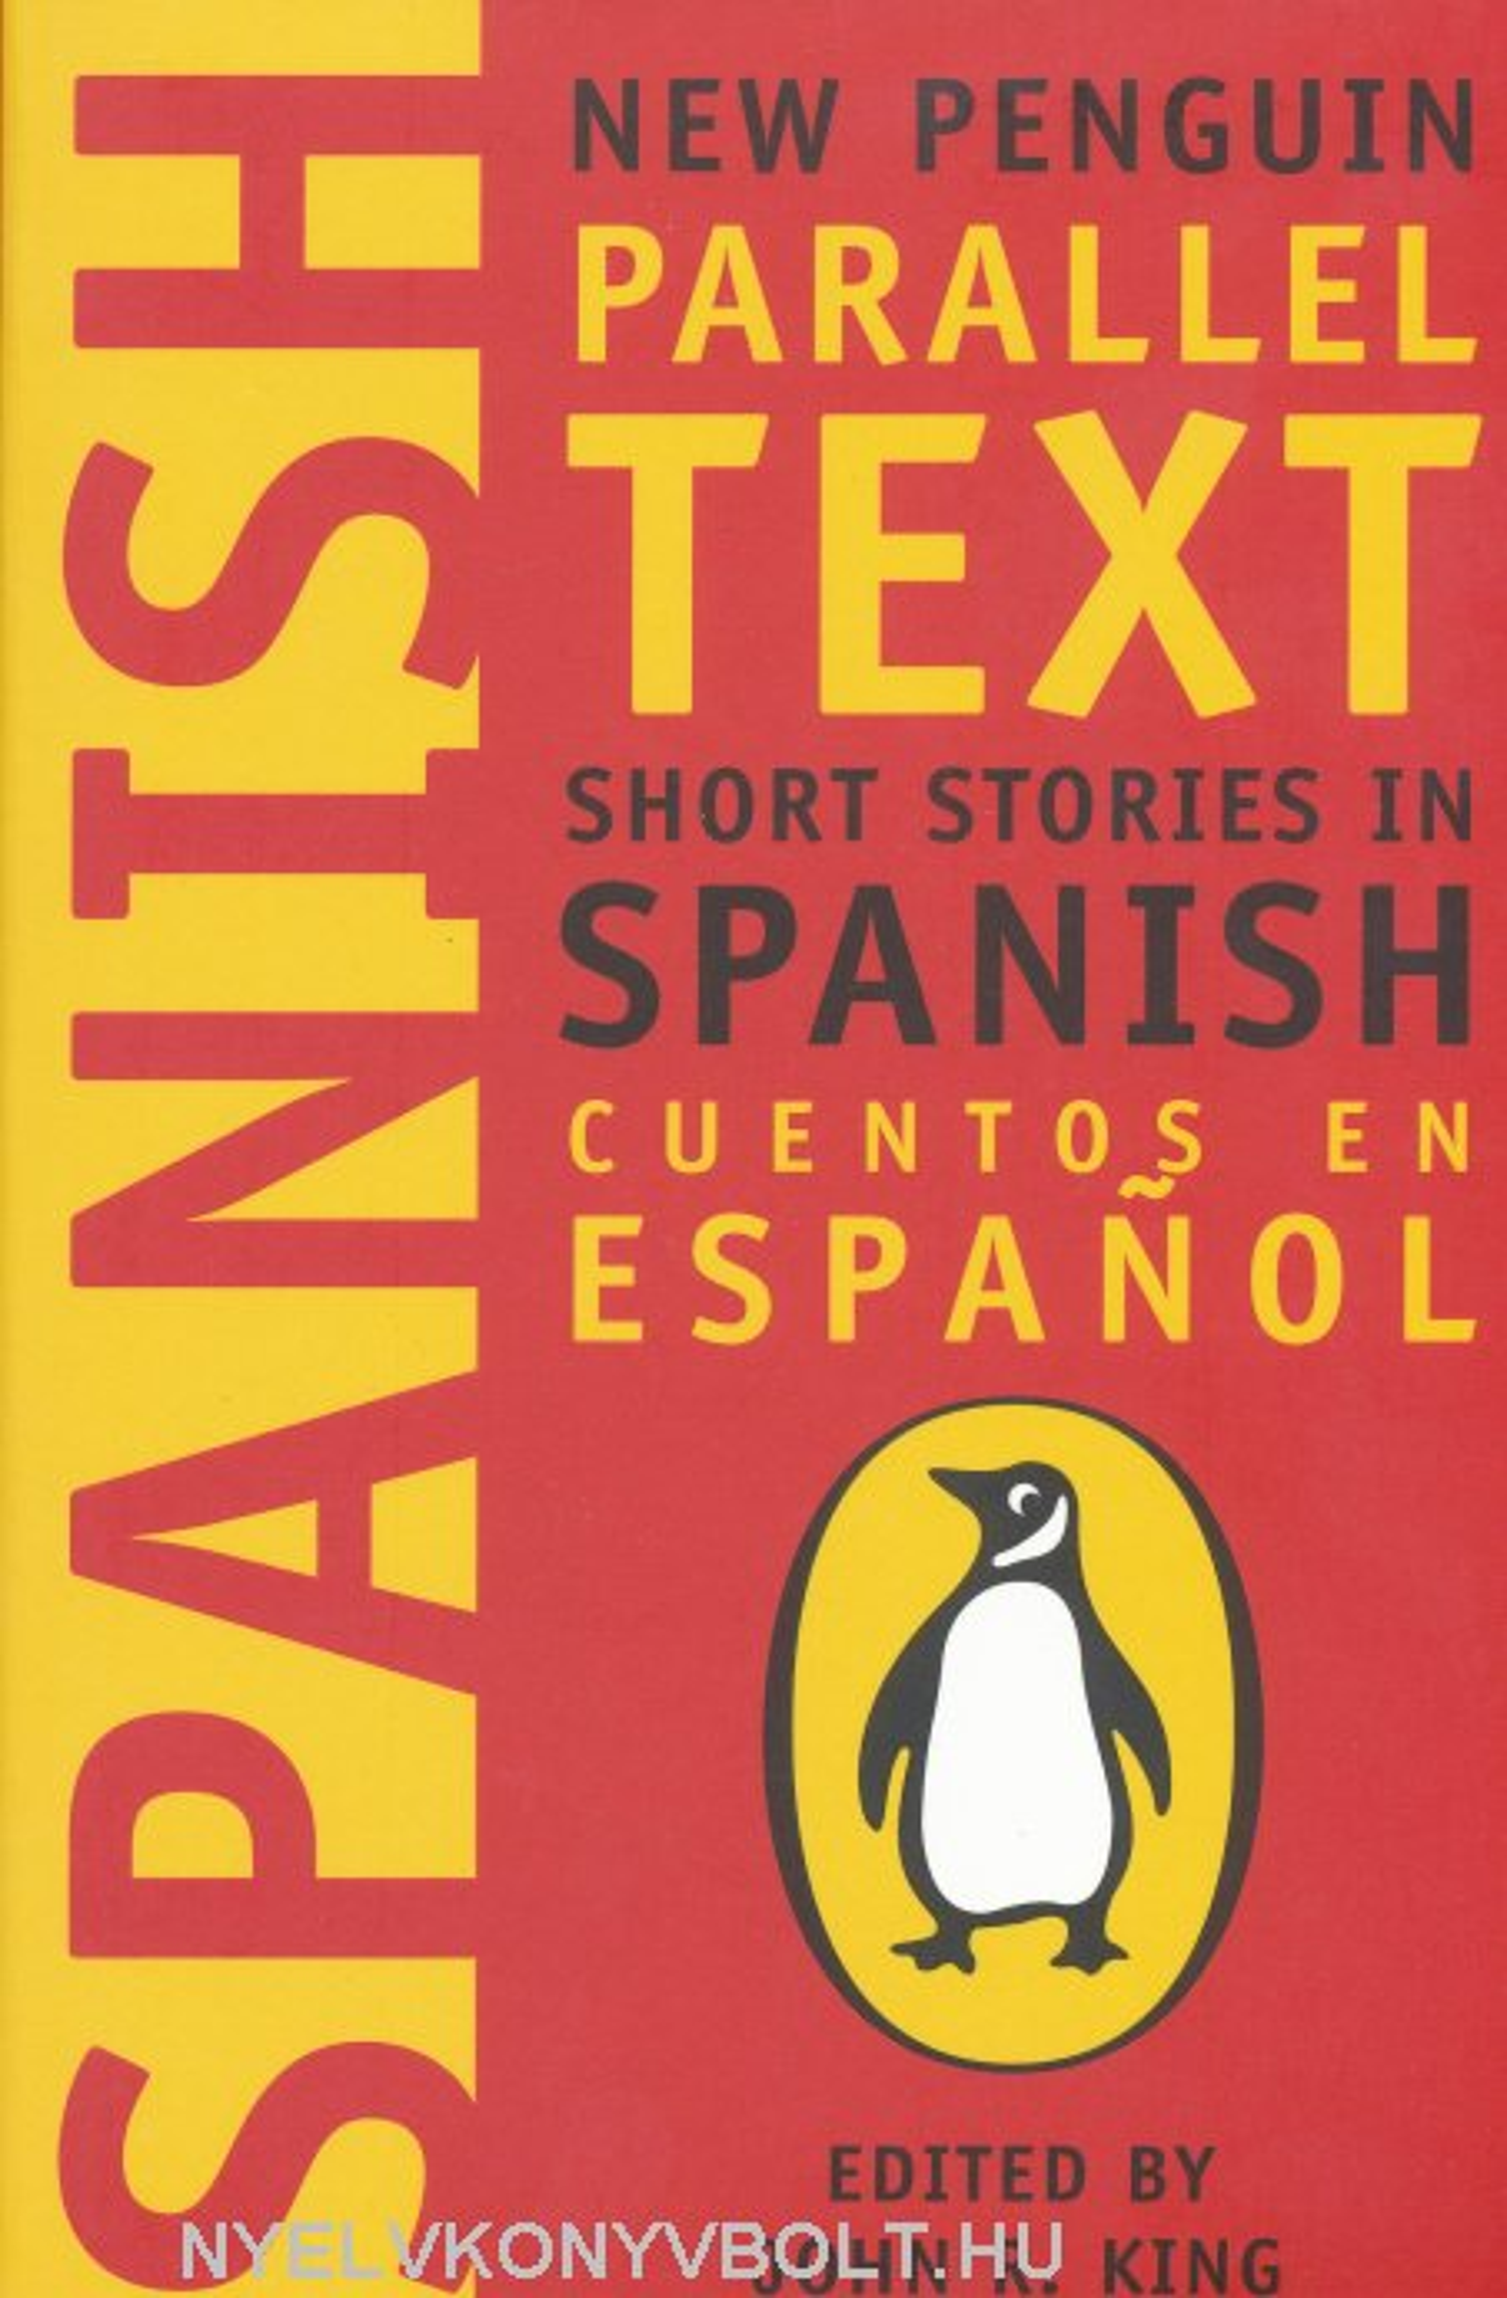 New Penguin Parallel Text - Short Stories in Spanish - Cuentos en Espanol